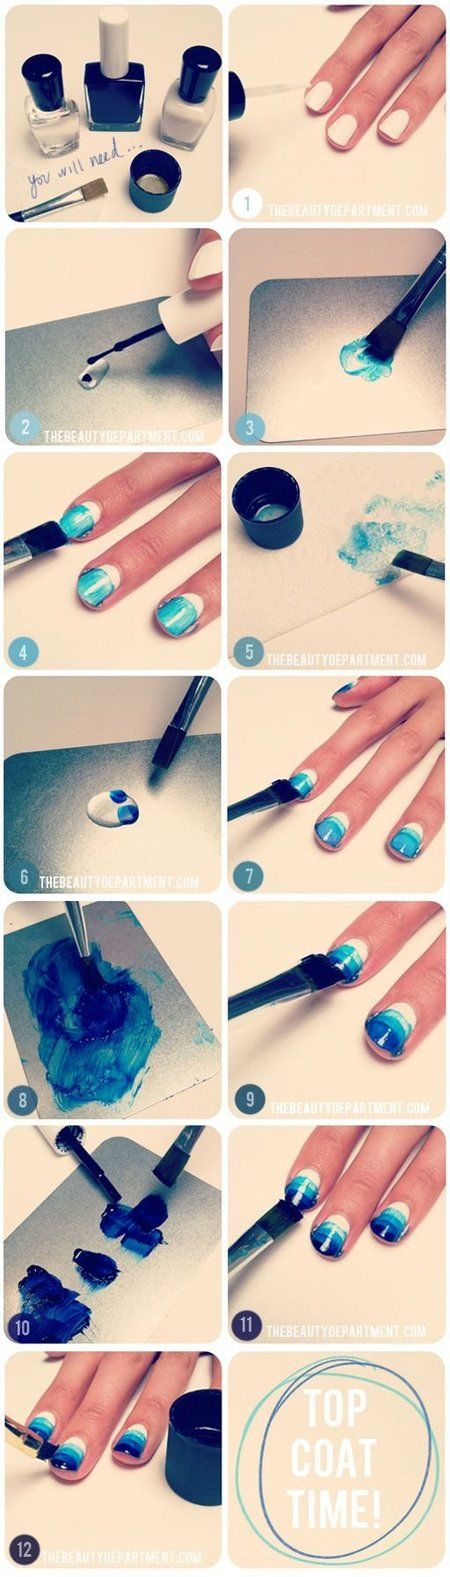 Top coat nail tutorial- bellashoot.com